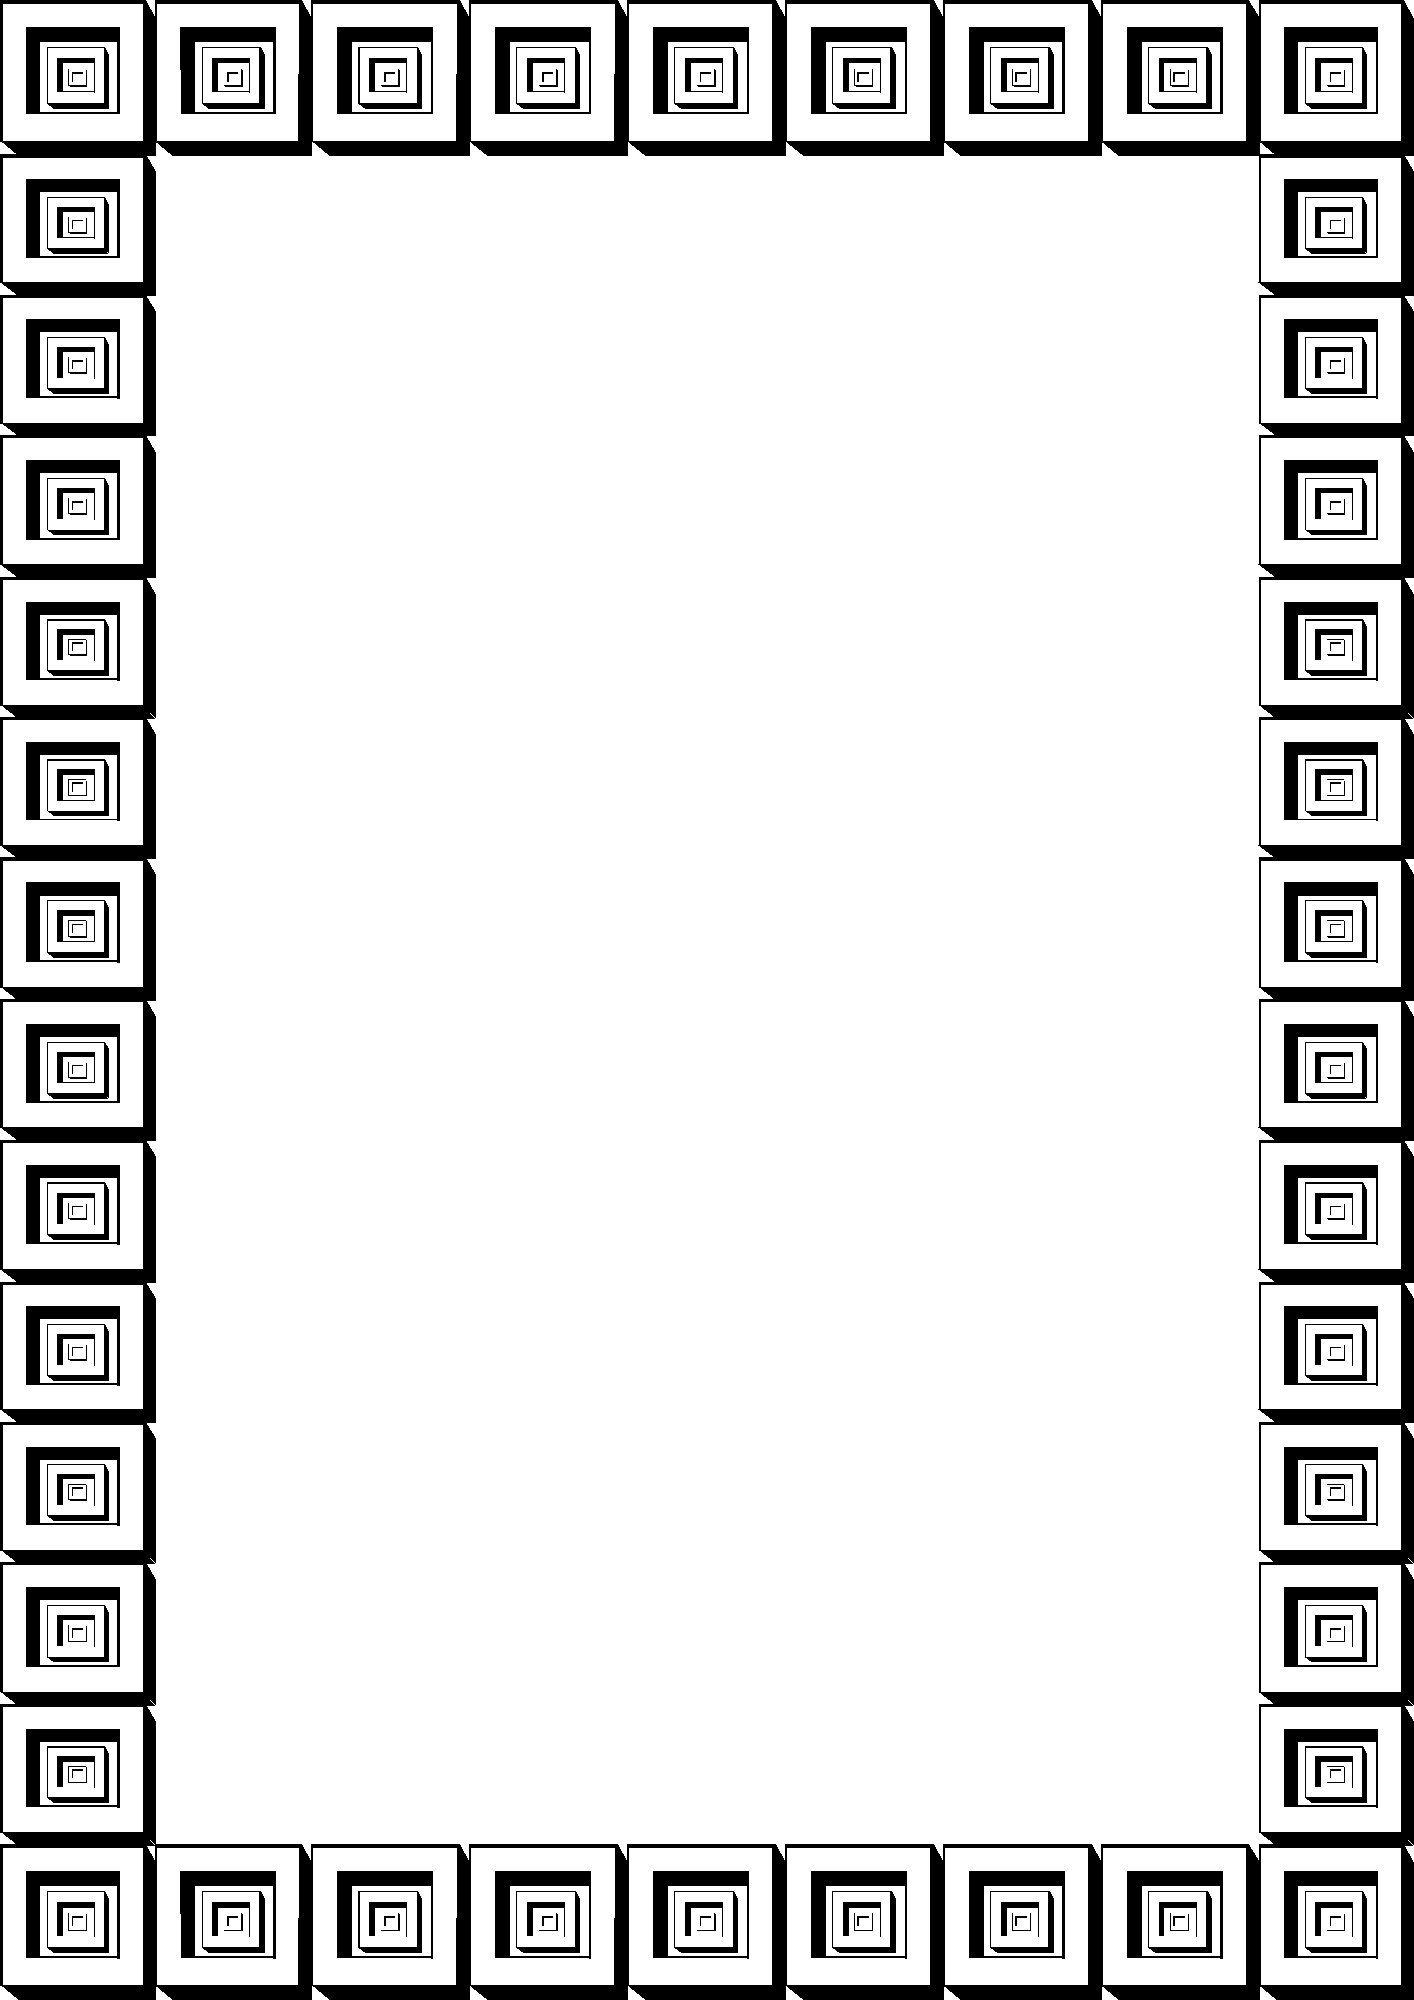 Border Frame Clip Art   Clipart Panda - Free Clipart Images ...